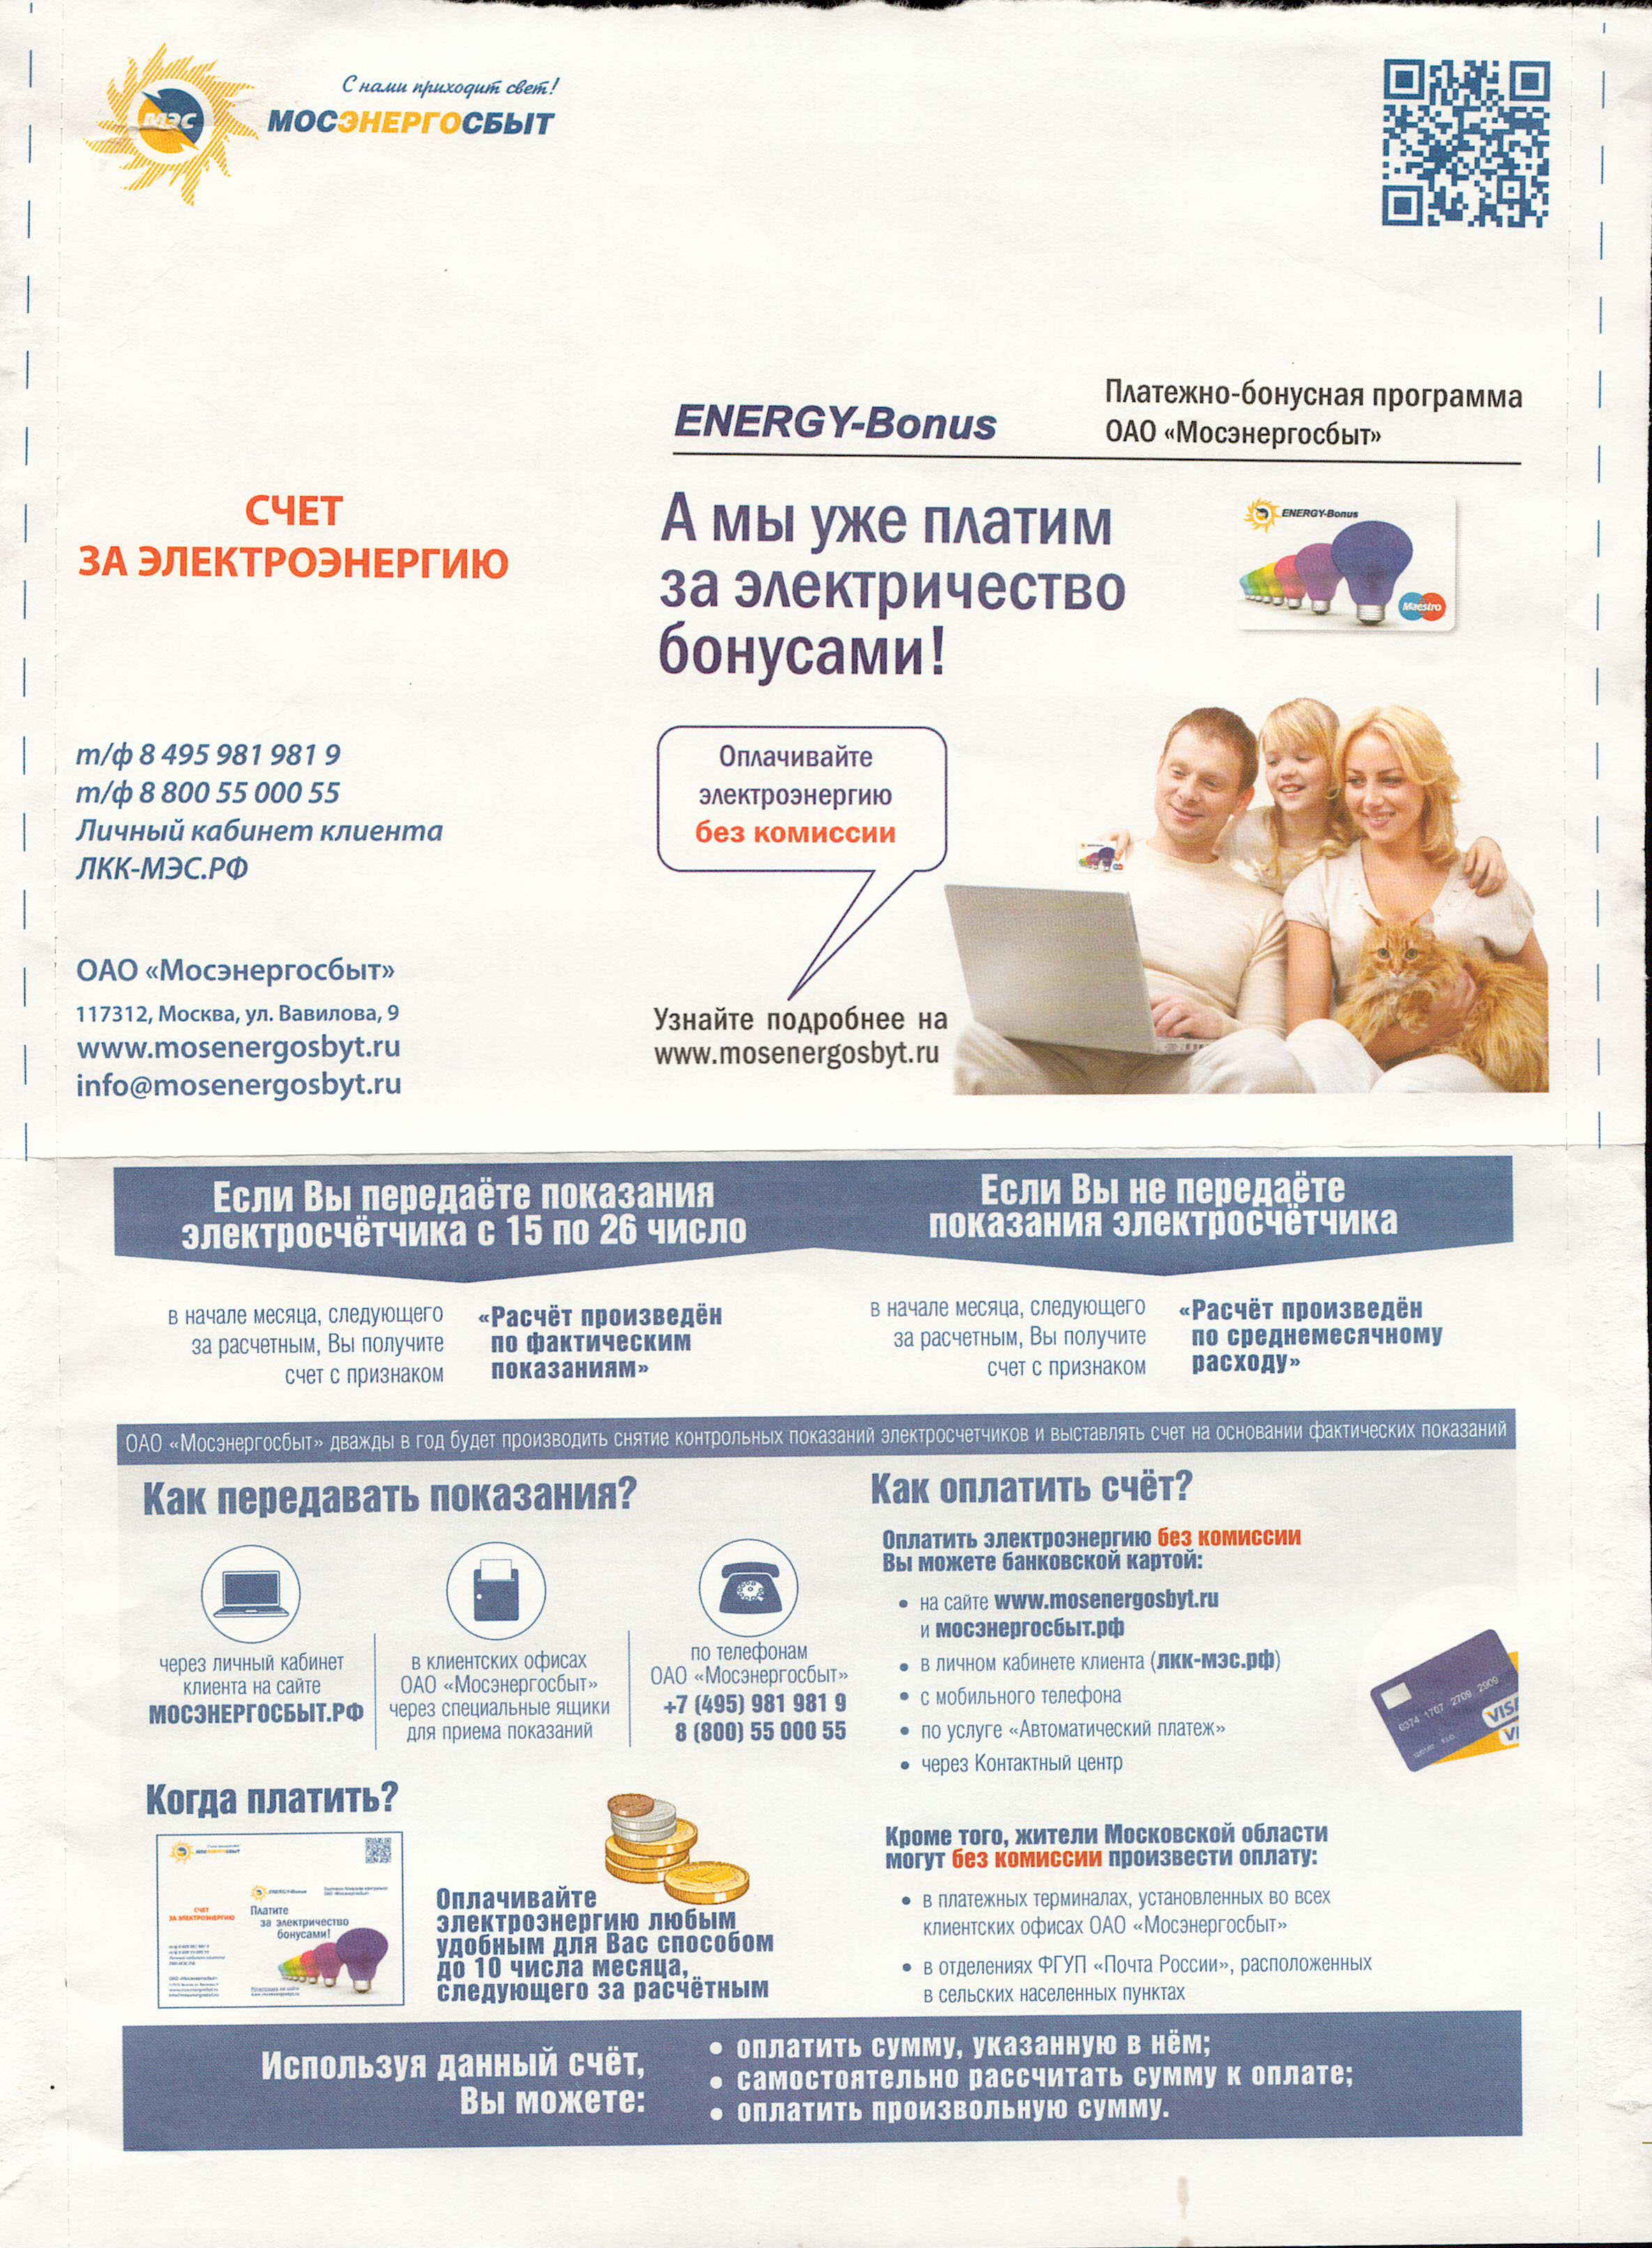 Сканер Xerox Mobile протяжный CIS A4 300x300dpi 24bit 497N01316